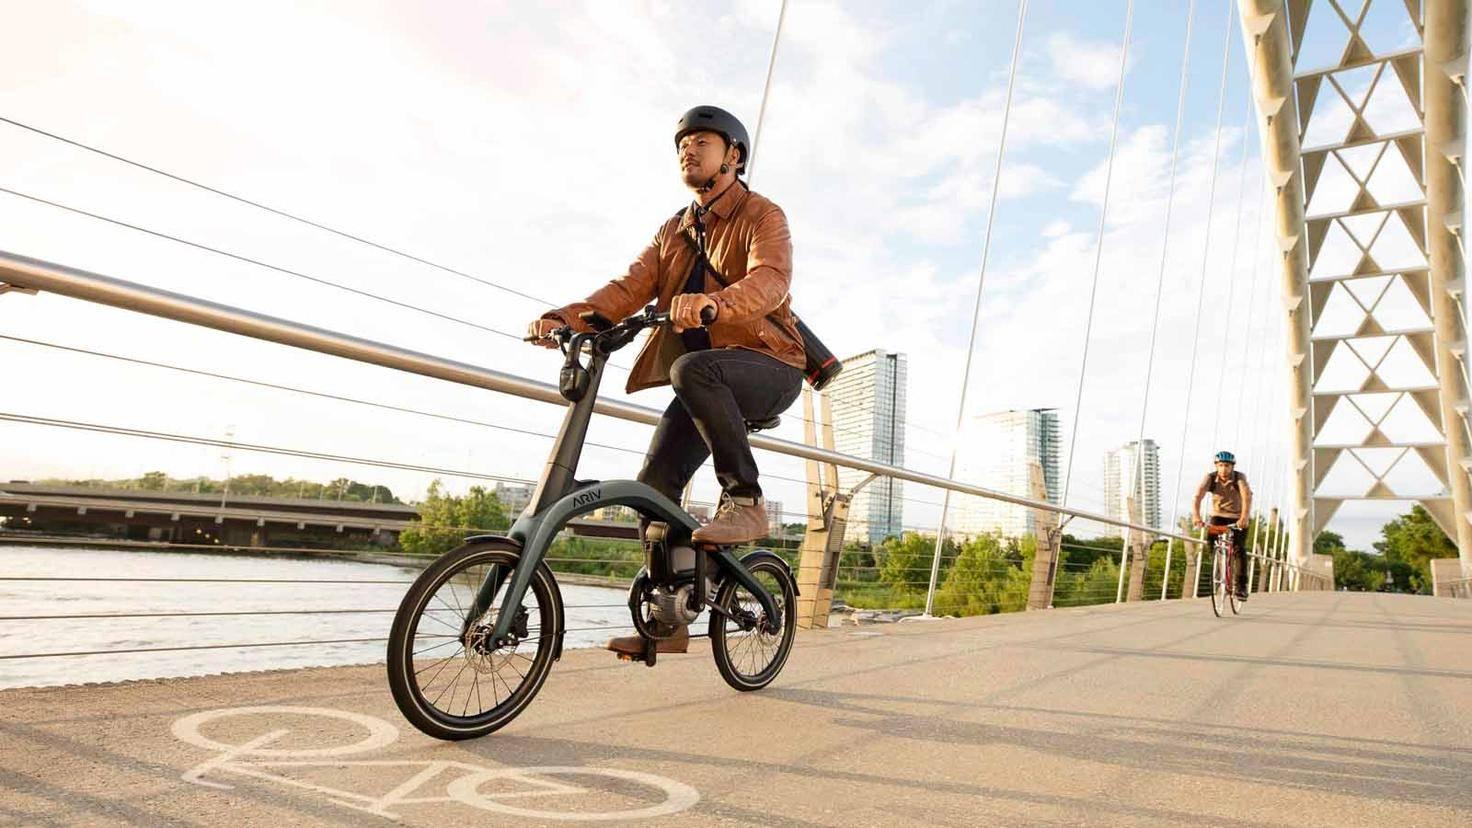 Ariv-Fahrrad-E-Bike-General Motors